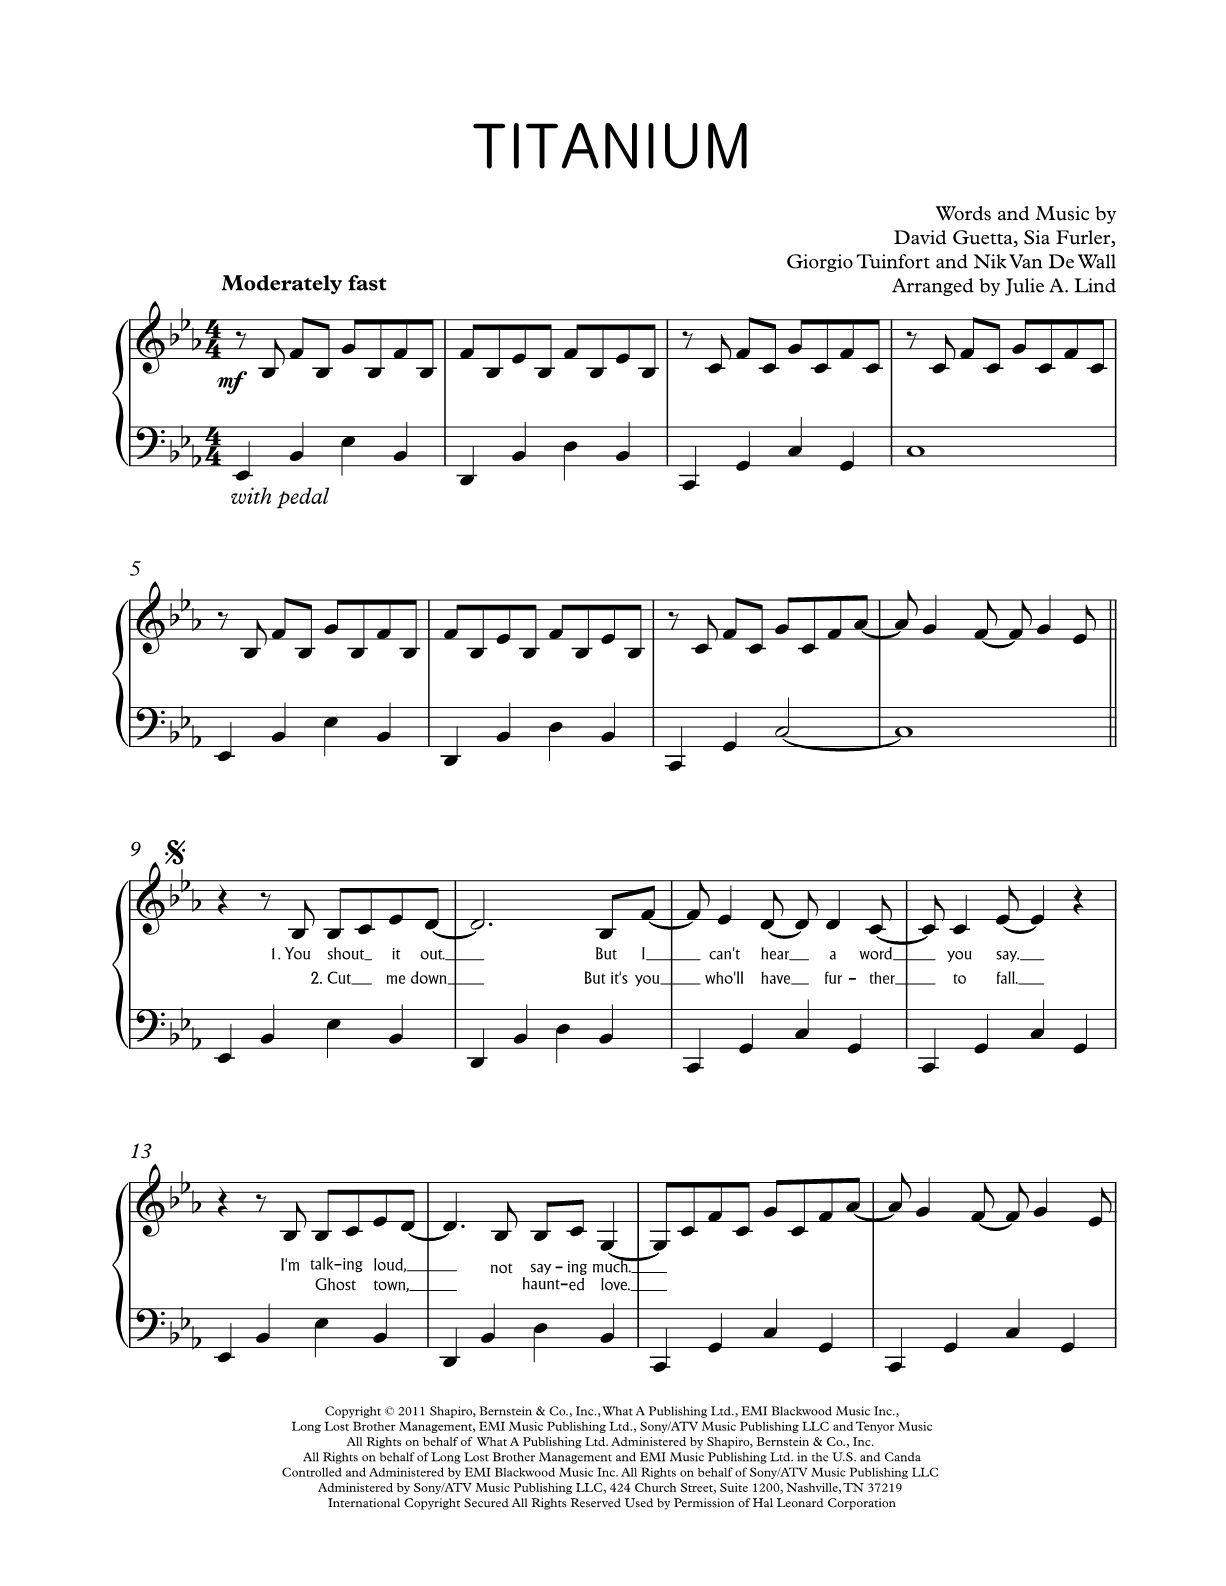 Titanium Piano Sheet Music For Intermediate Piano Players